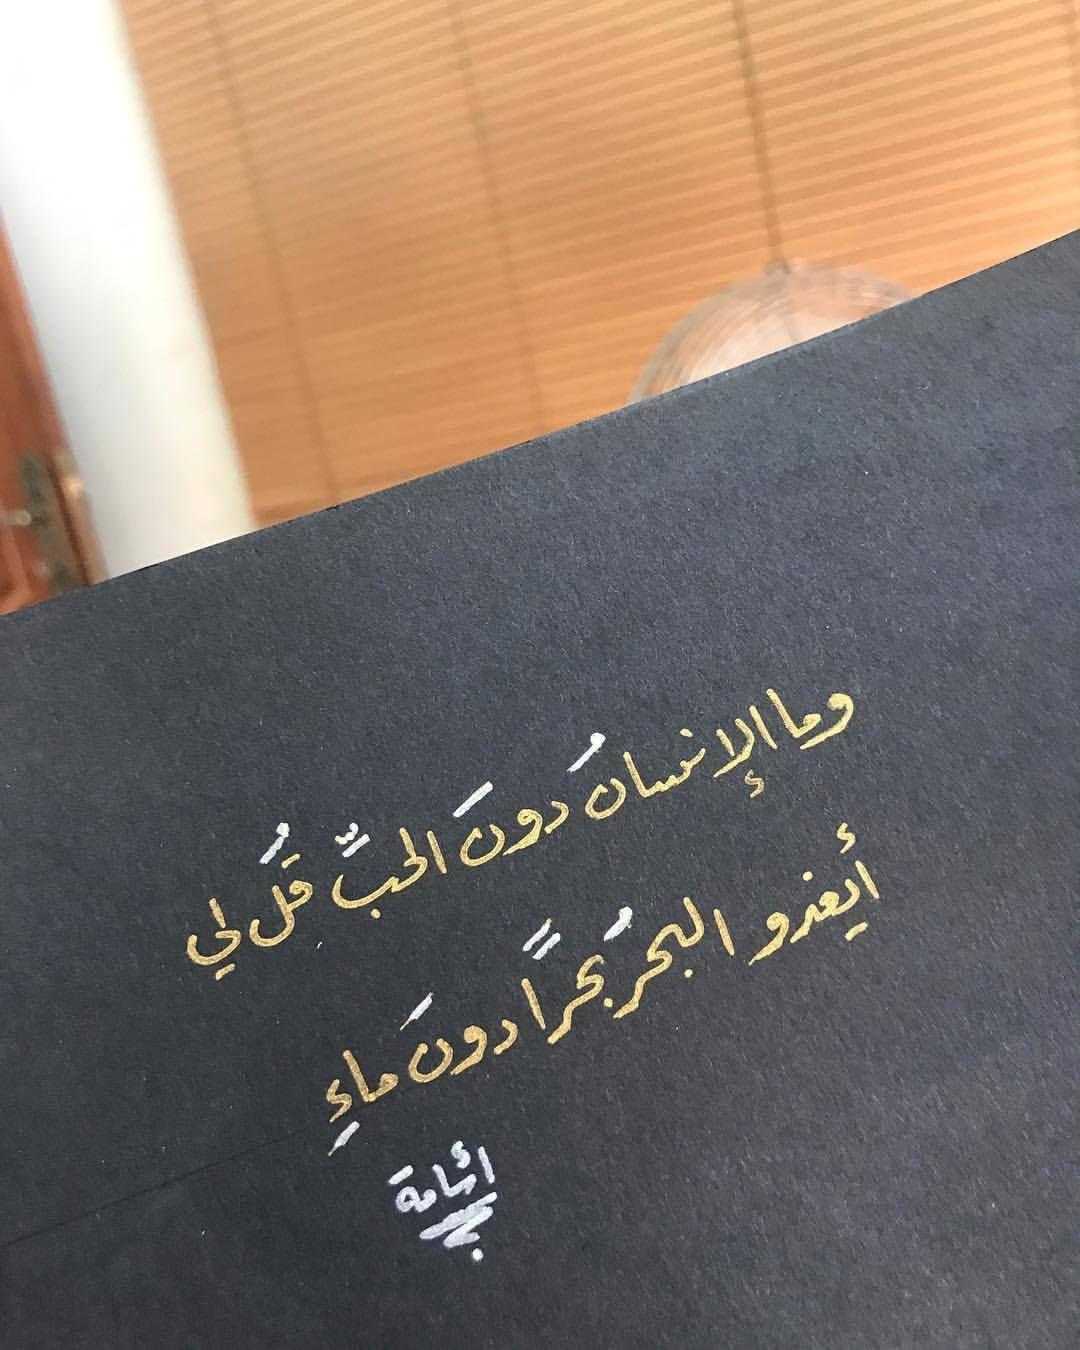 أيغدو البحر بحر ا دون ماء Bts Lyrics Quotes Photo Quotes Mood Quotes